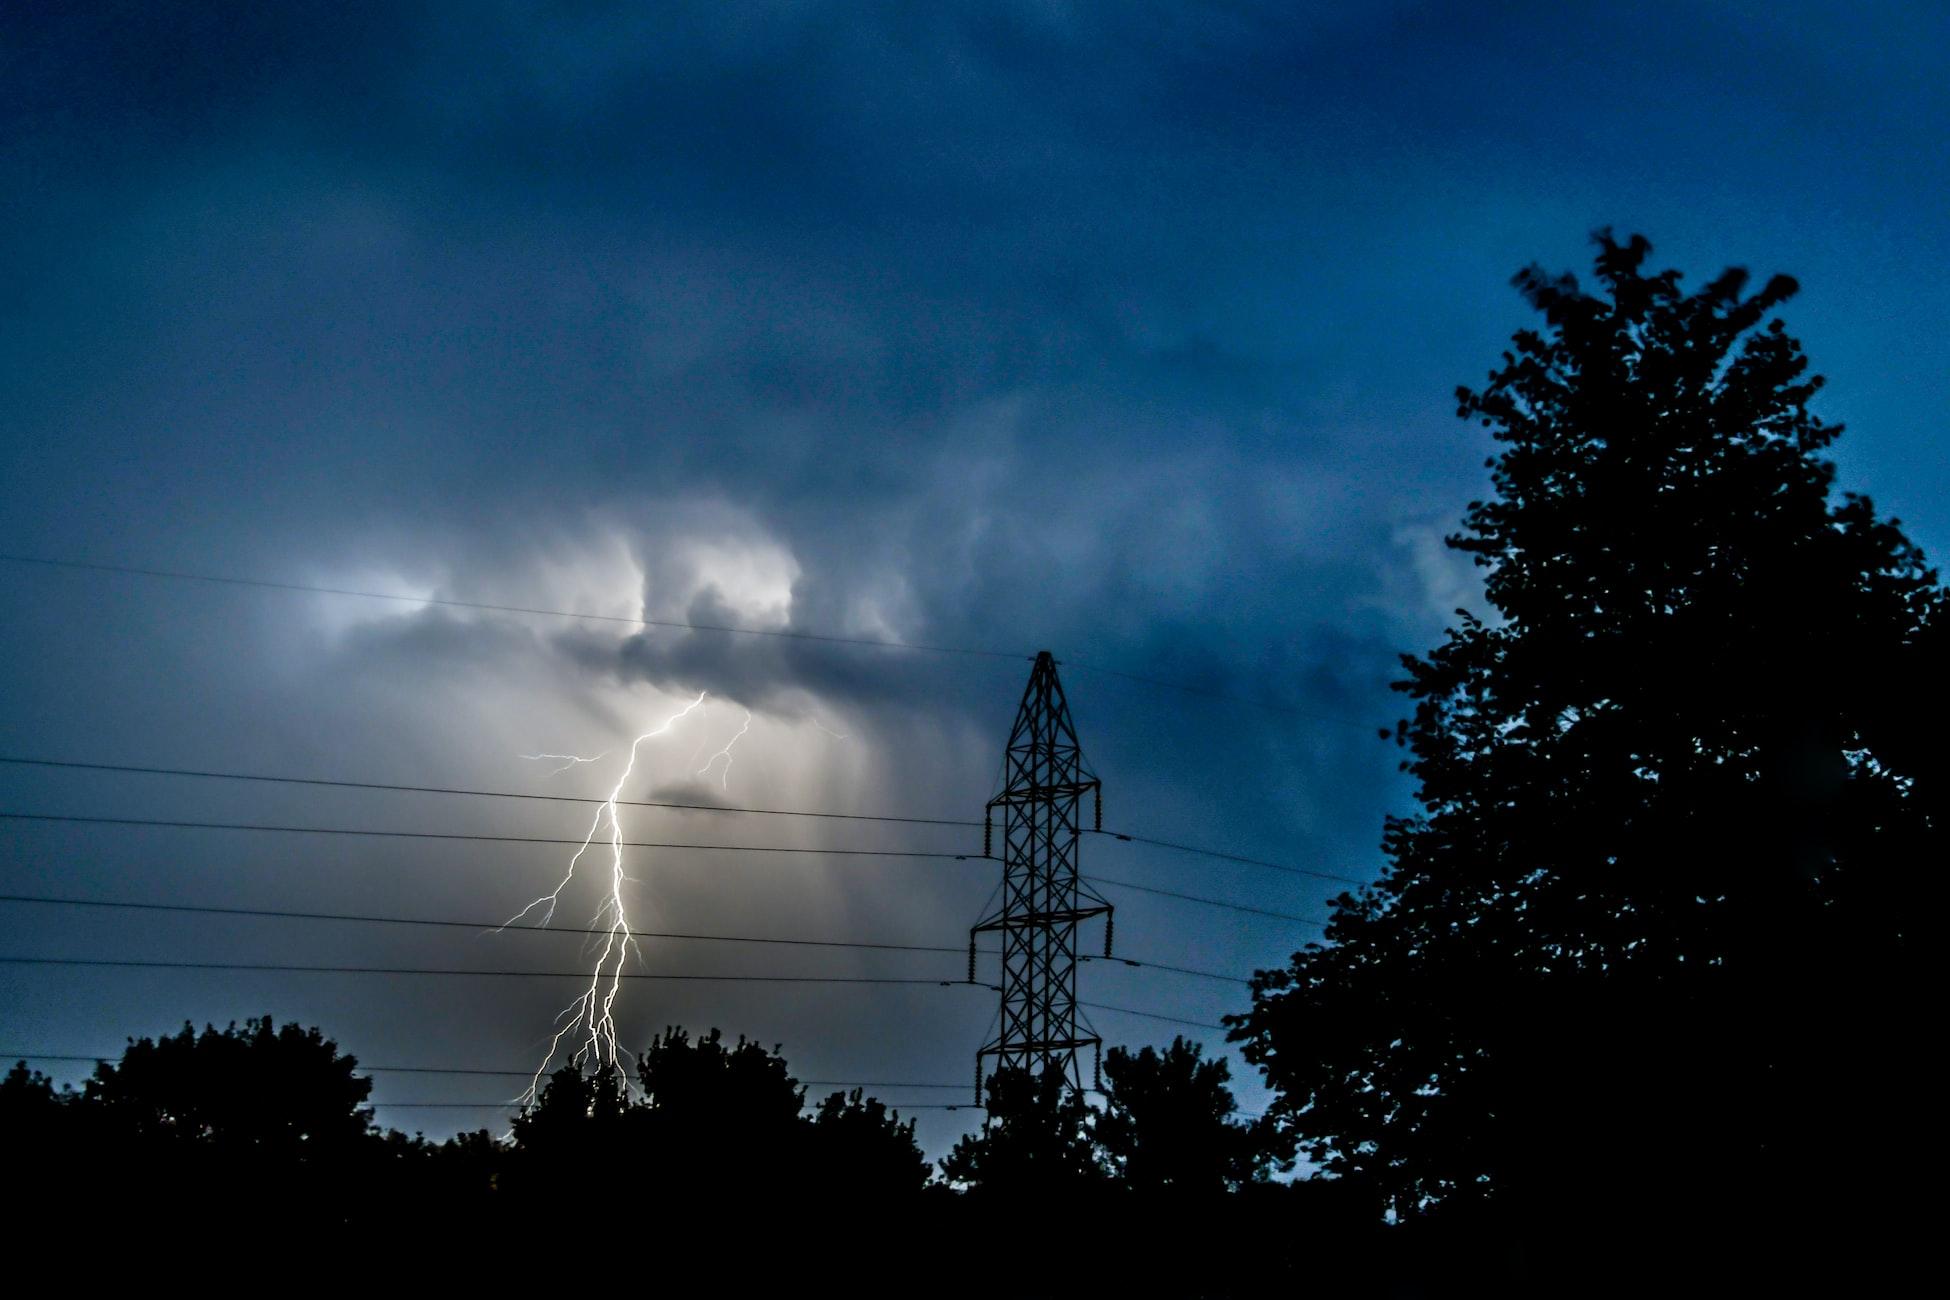 Lightning strike in Lincoln, Nebraska